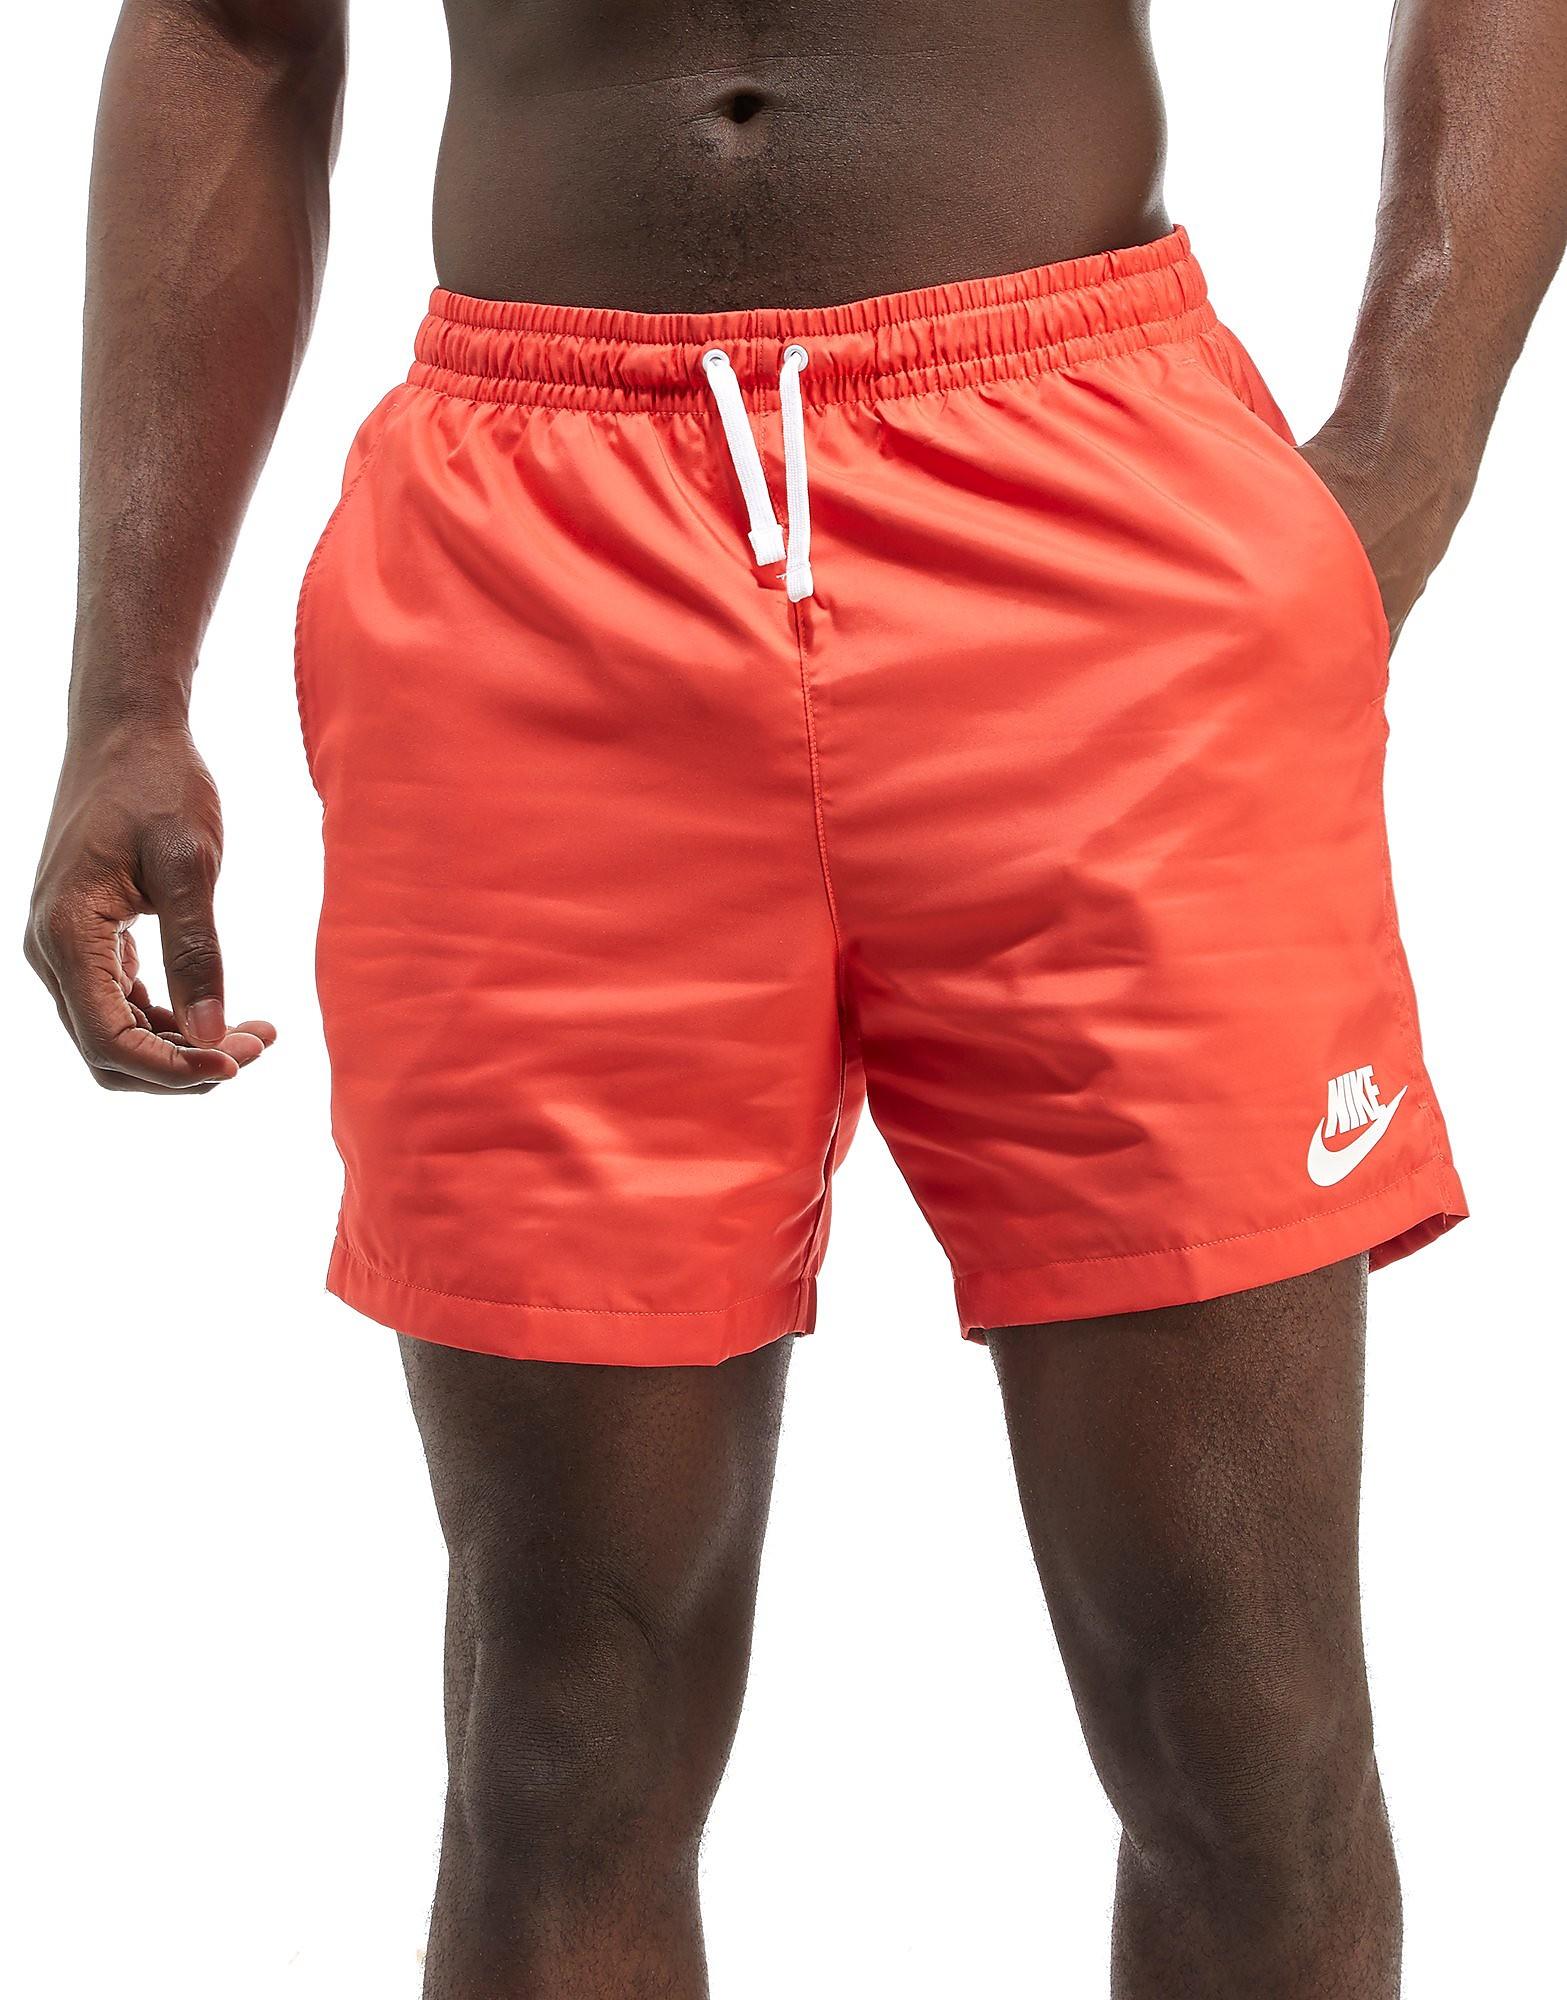 Nike Flow Shorts